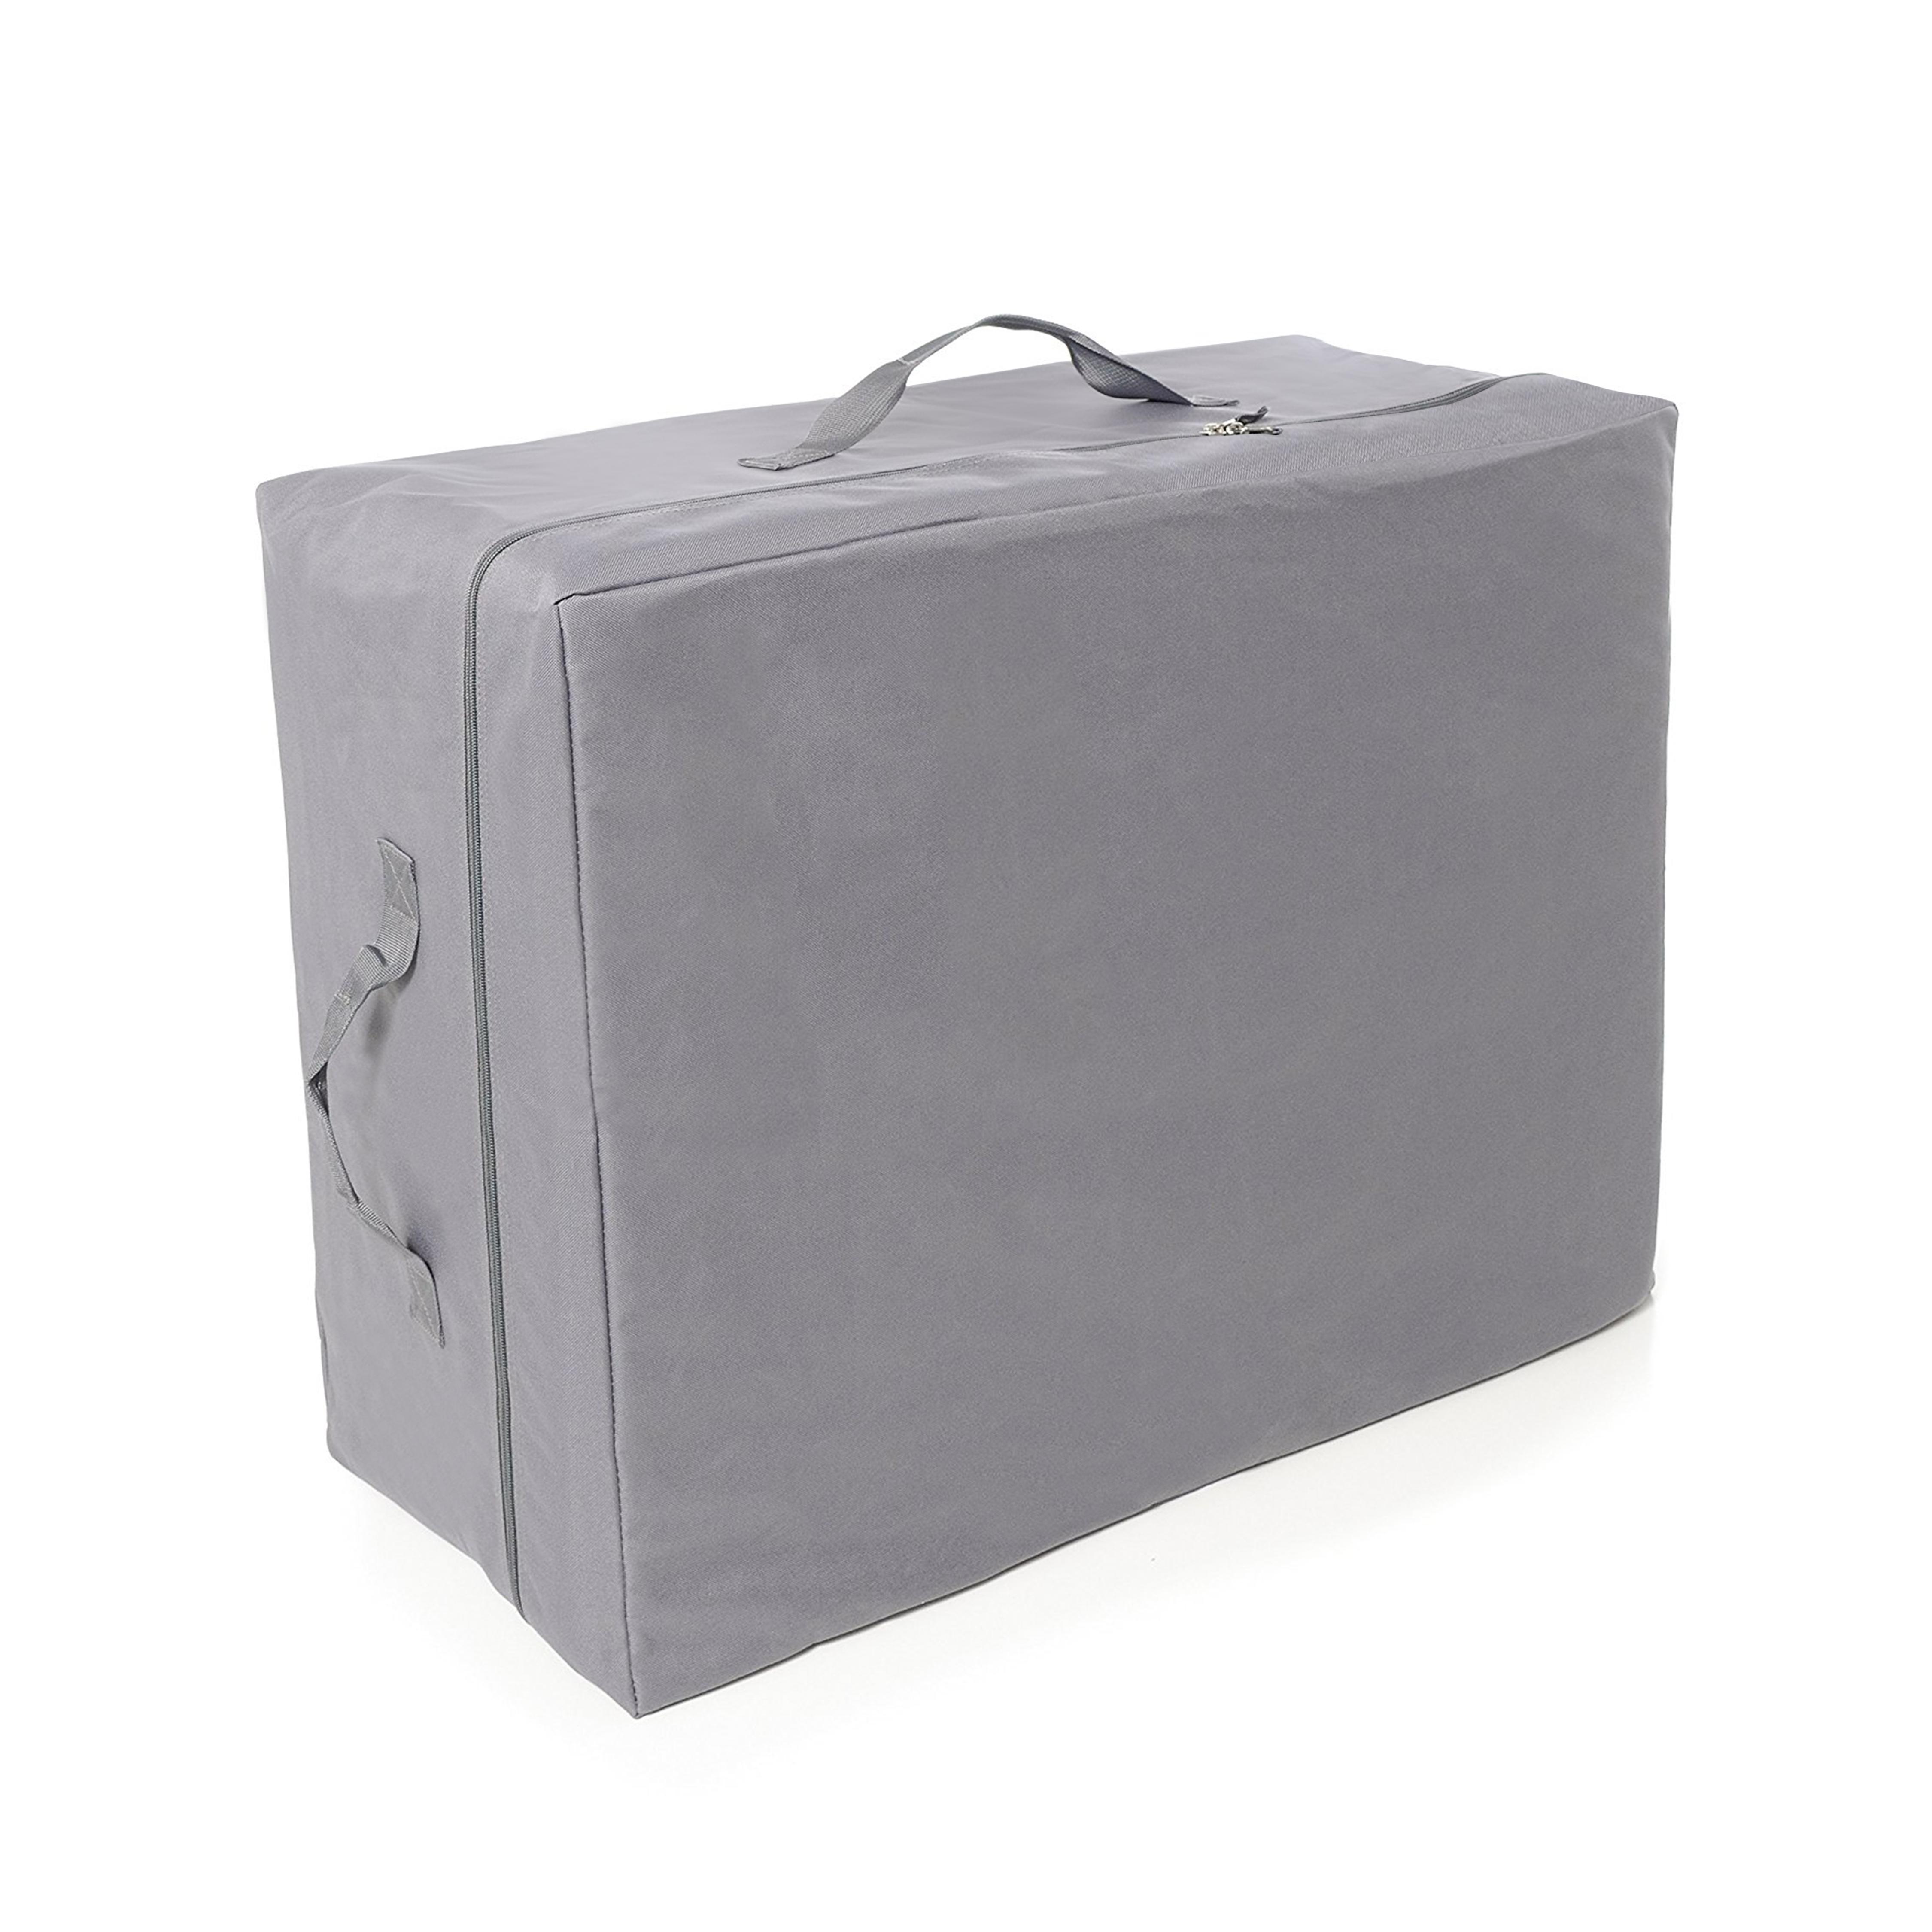 Milliard - Carry Case For Milliard Tri-Fold Mattress (6 ...